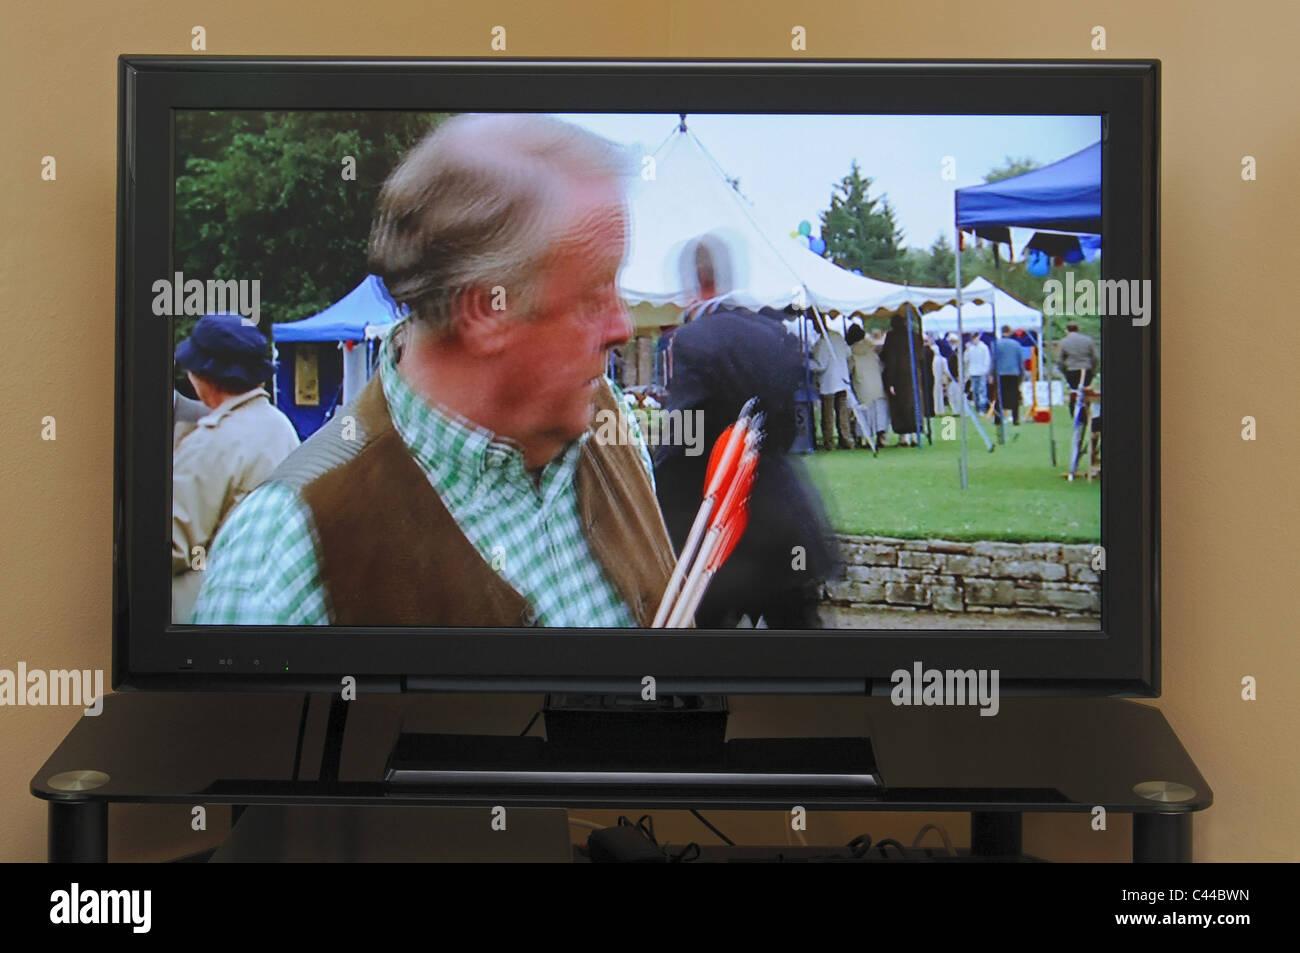 Modern LCD Television, Calypso, Costa del Sol, Malaga Province, Andalucia, Spain, Western Europe. - Stock Image